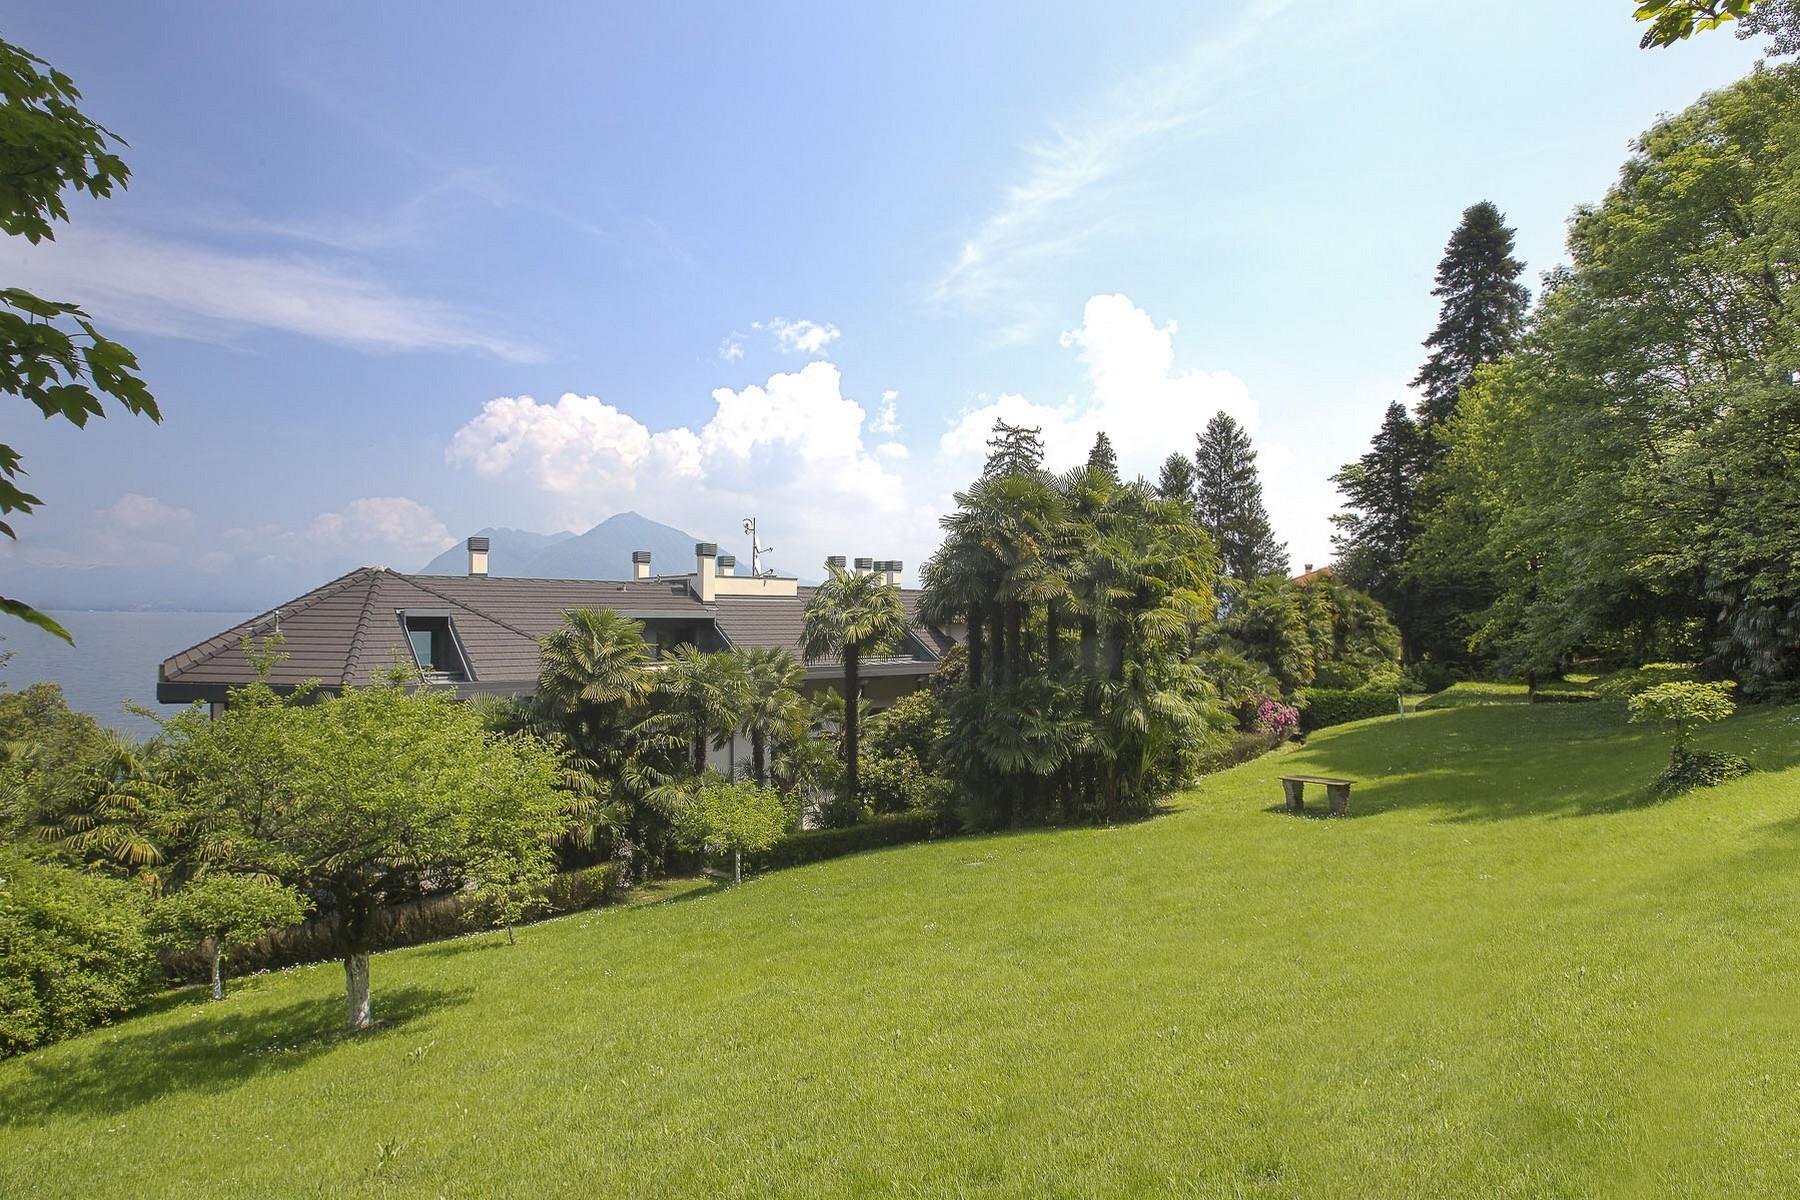 Villa in Vendita a Stresa: 5 locali, 1440 mq - Foto 9